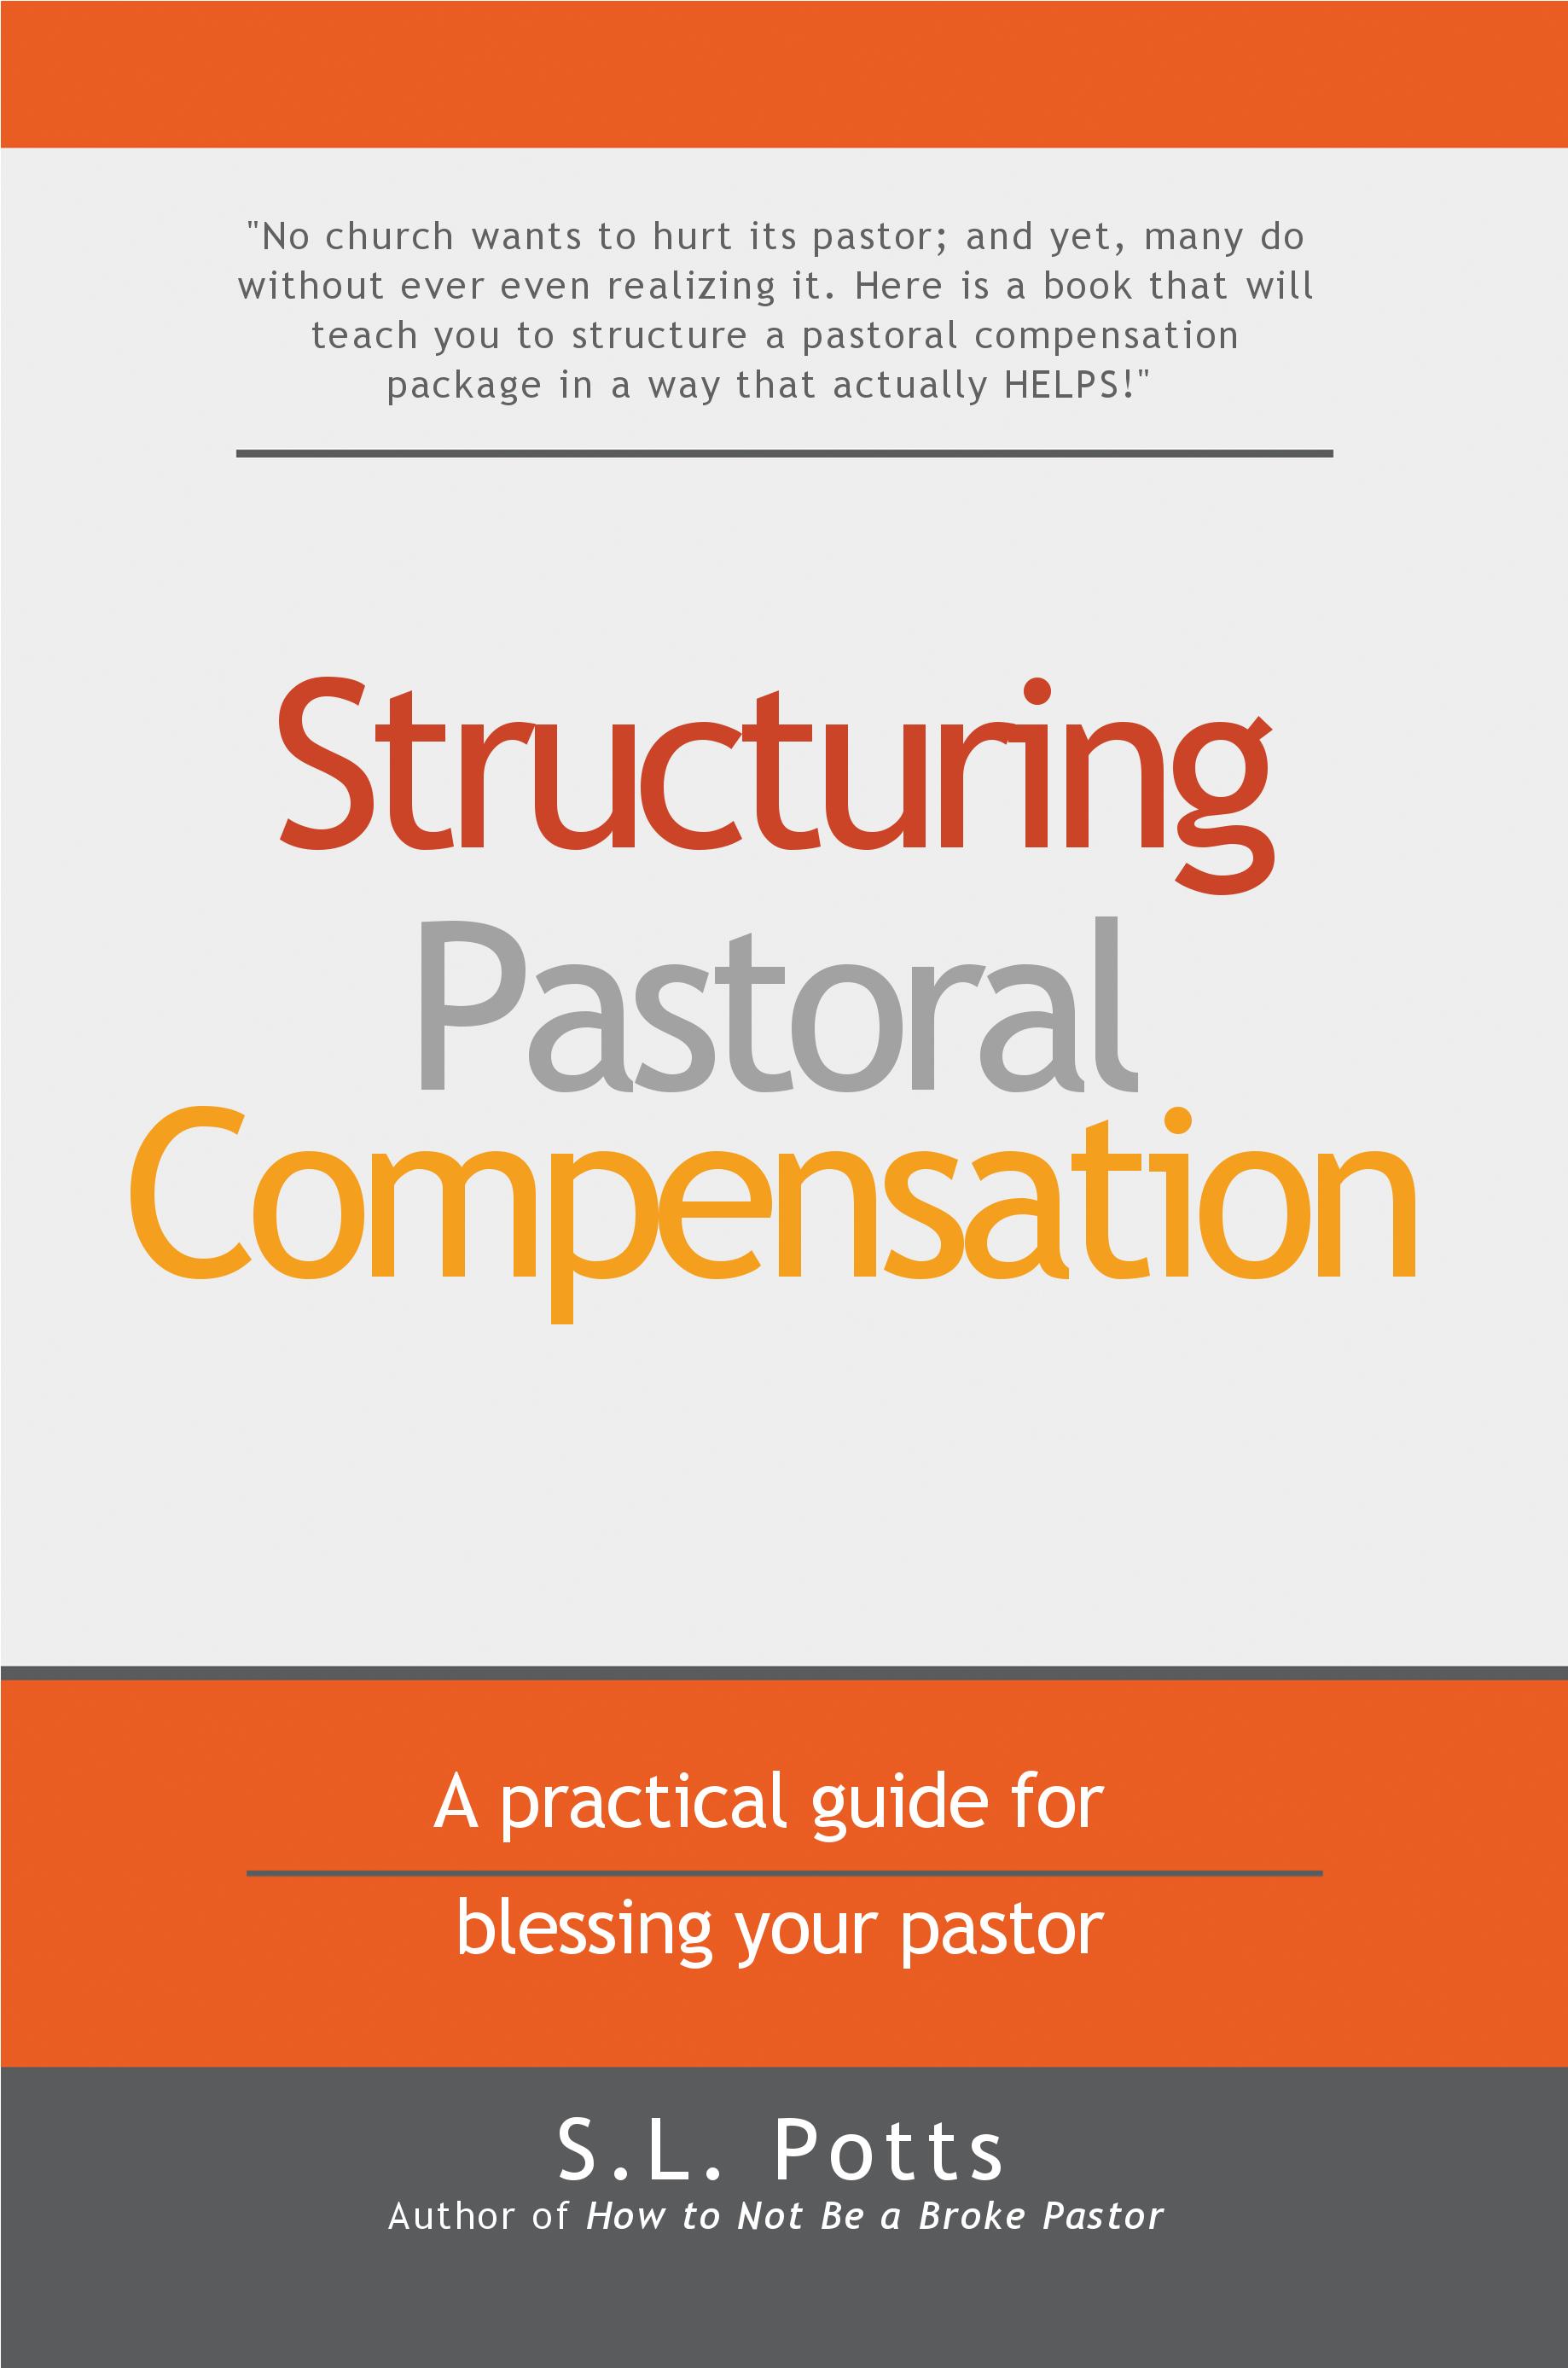 StructuringPastoralCompensationFrontMBED.jpg